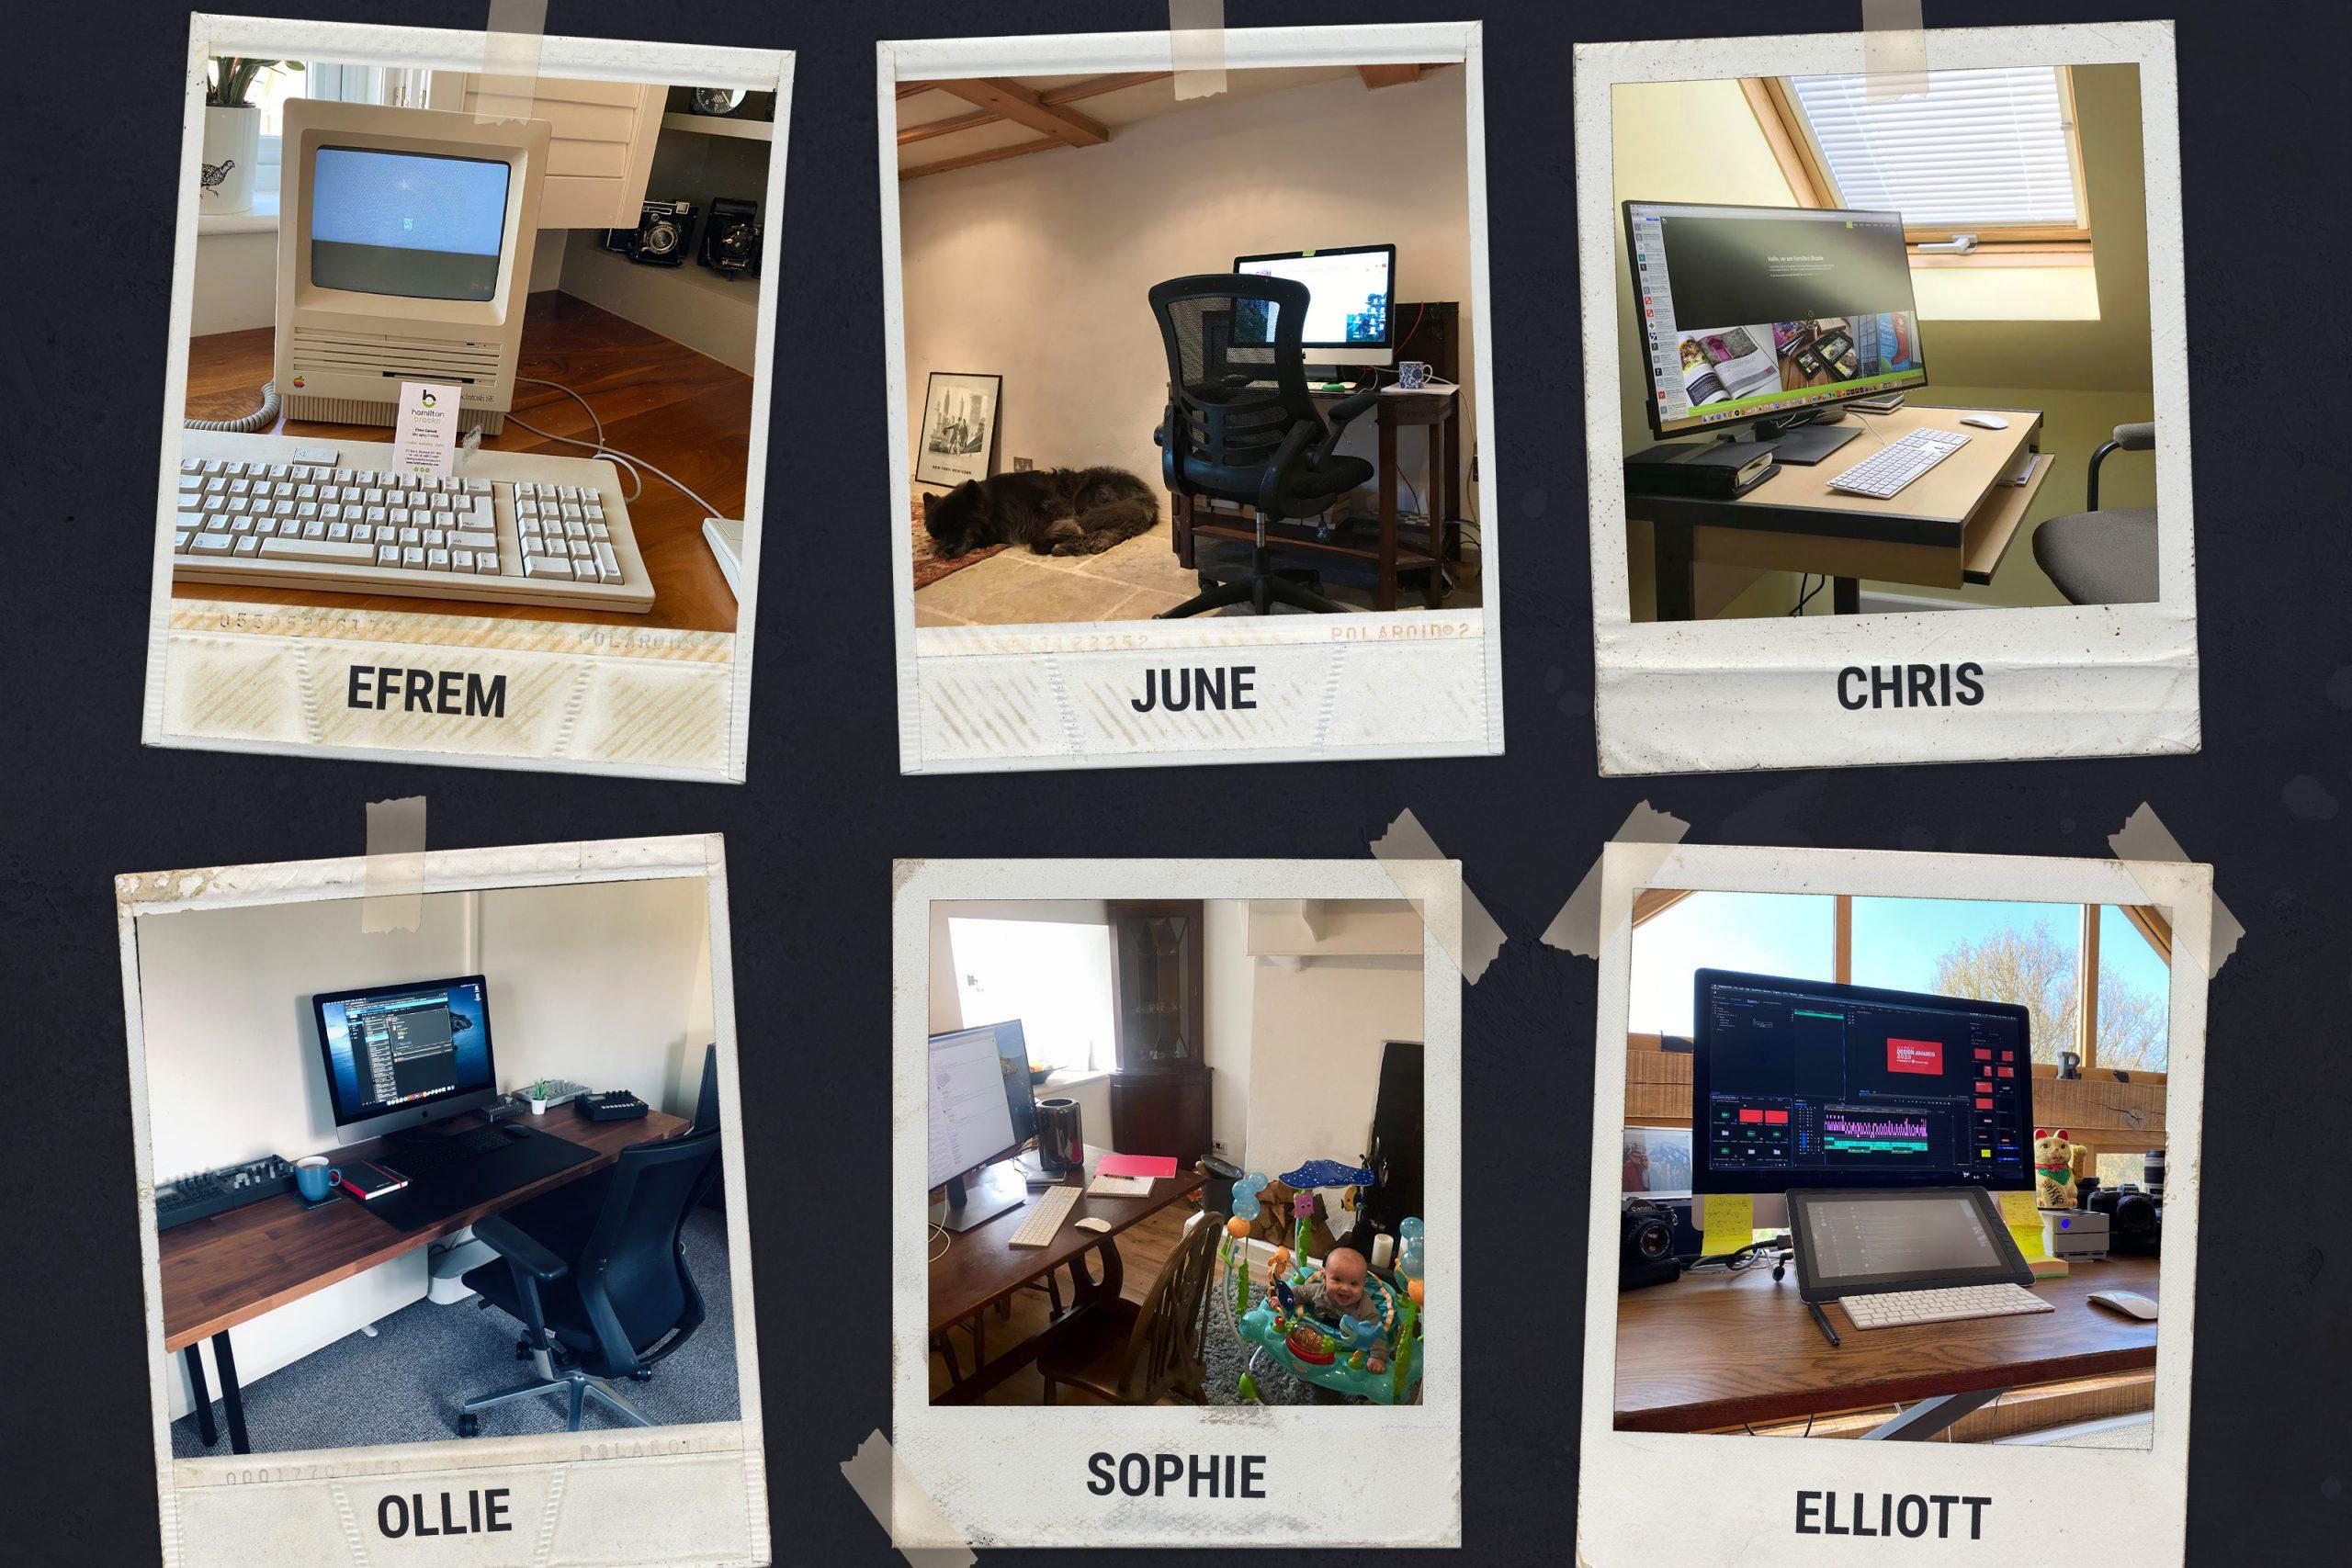 Same team, different desks!